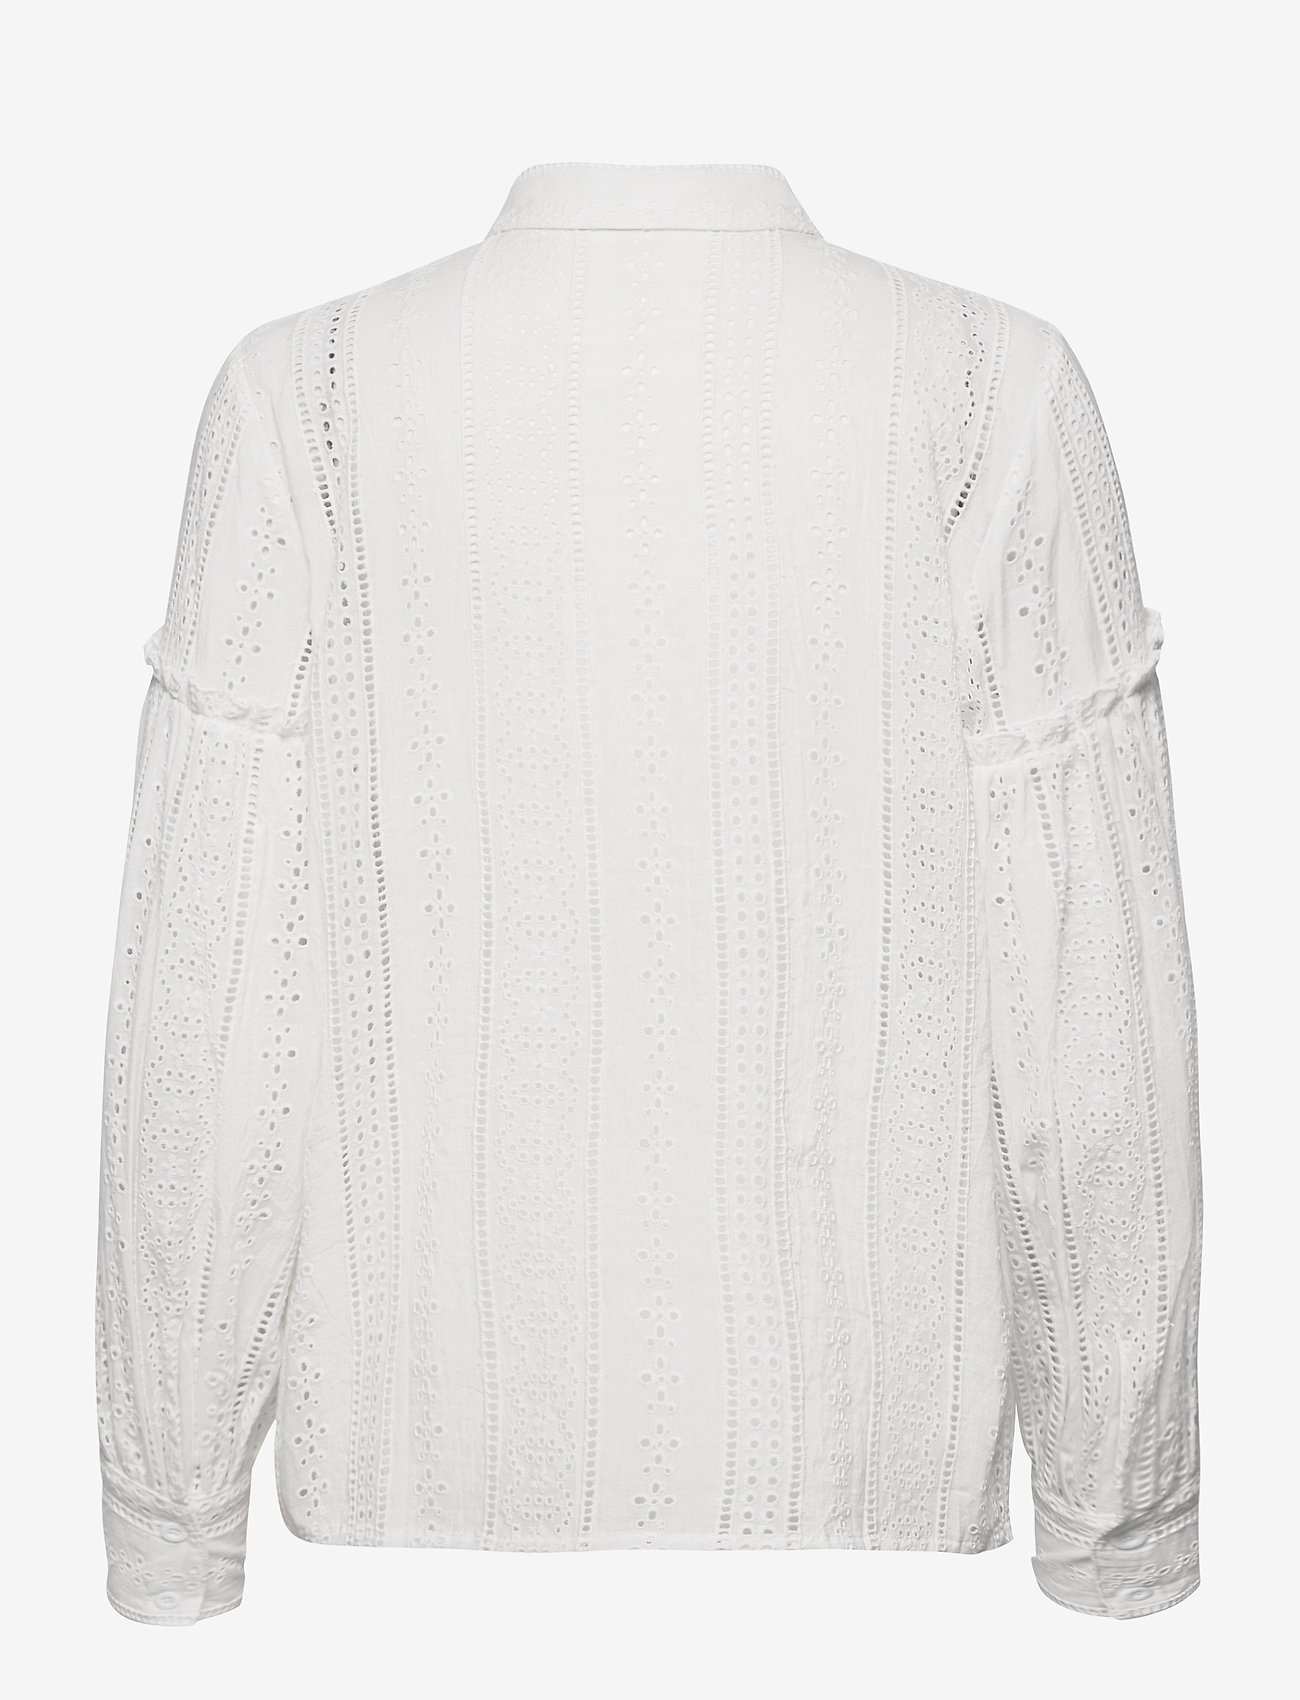 By Malina - Juno blouse - långärmade skjortor - white - 1